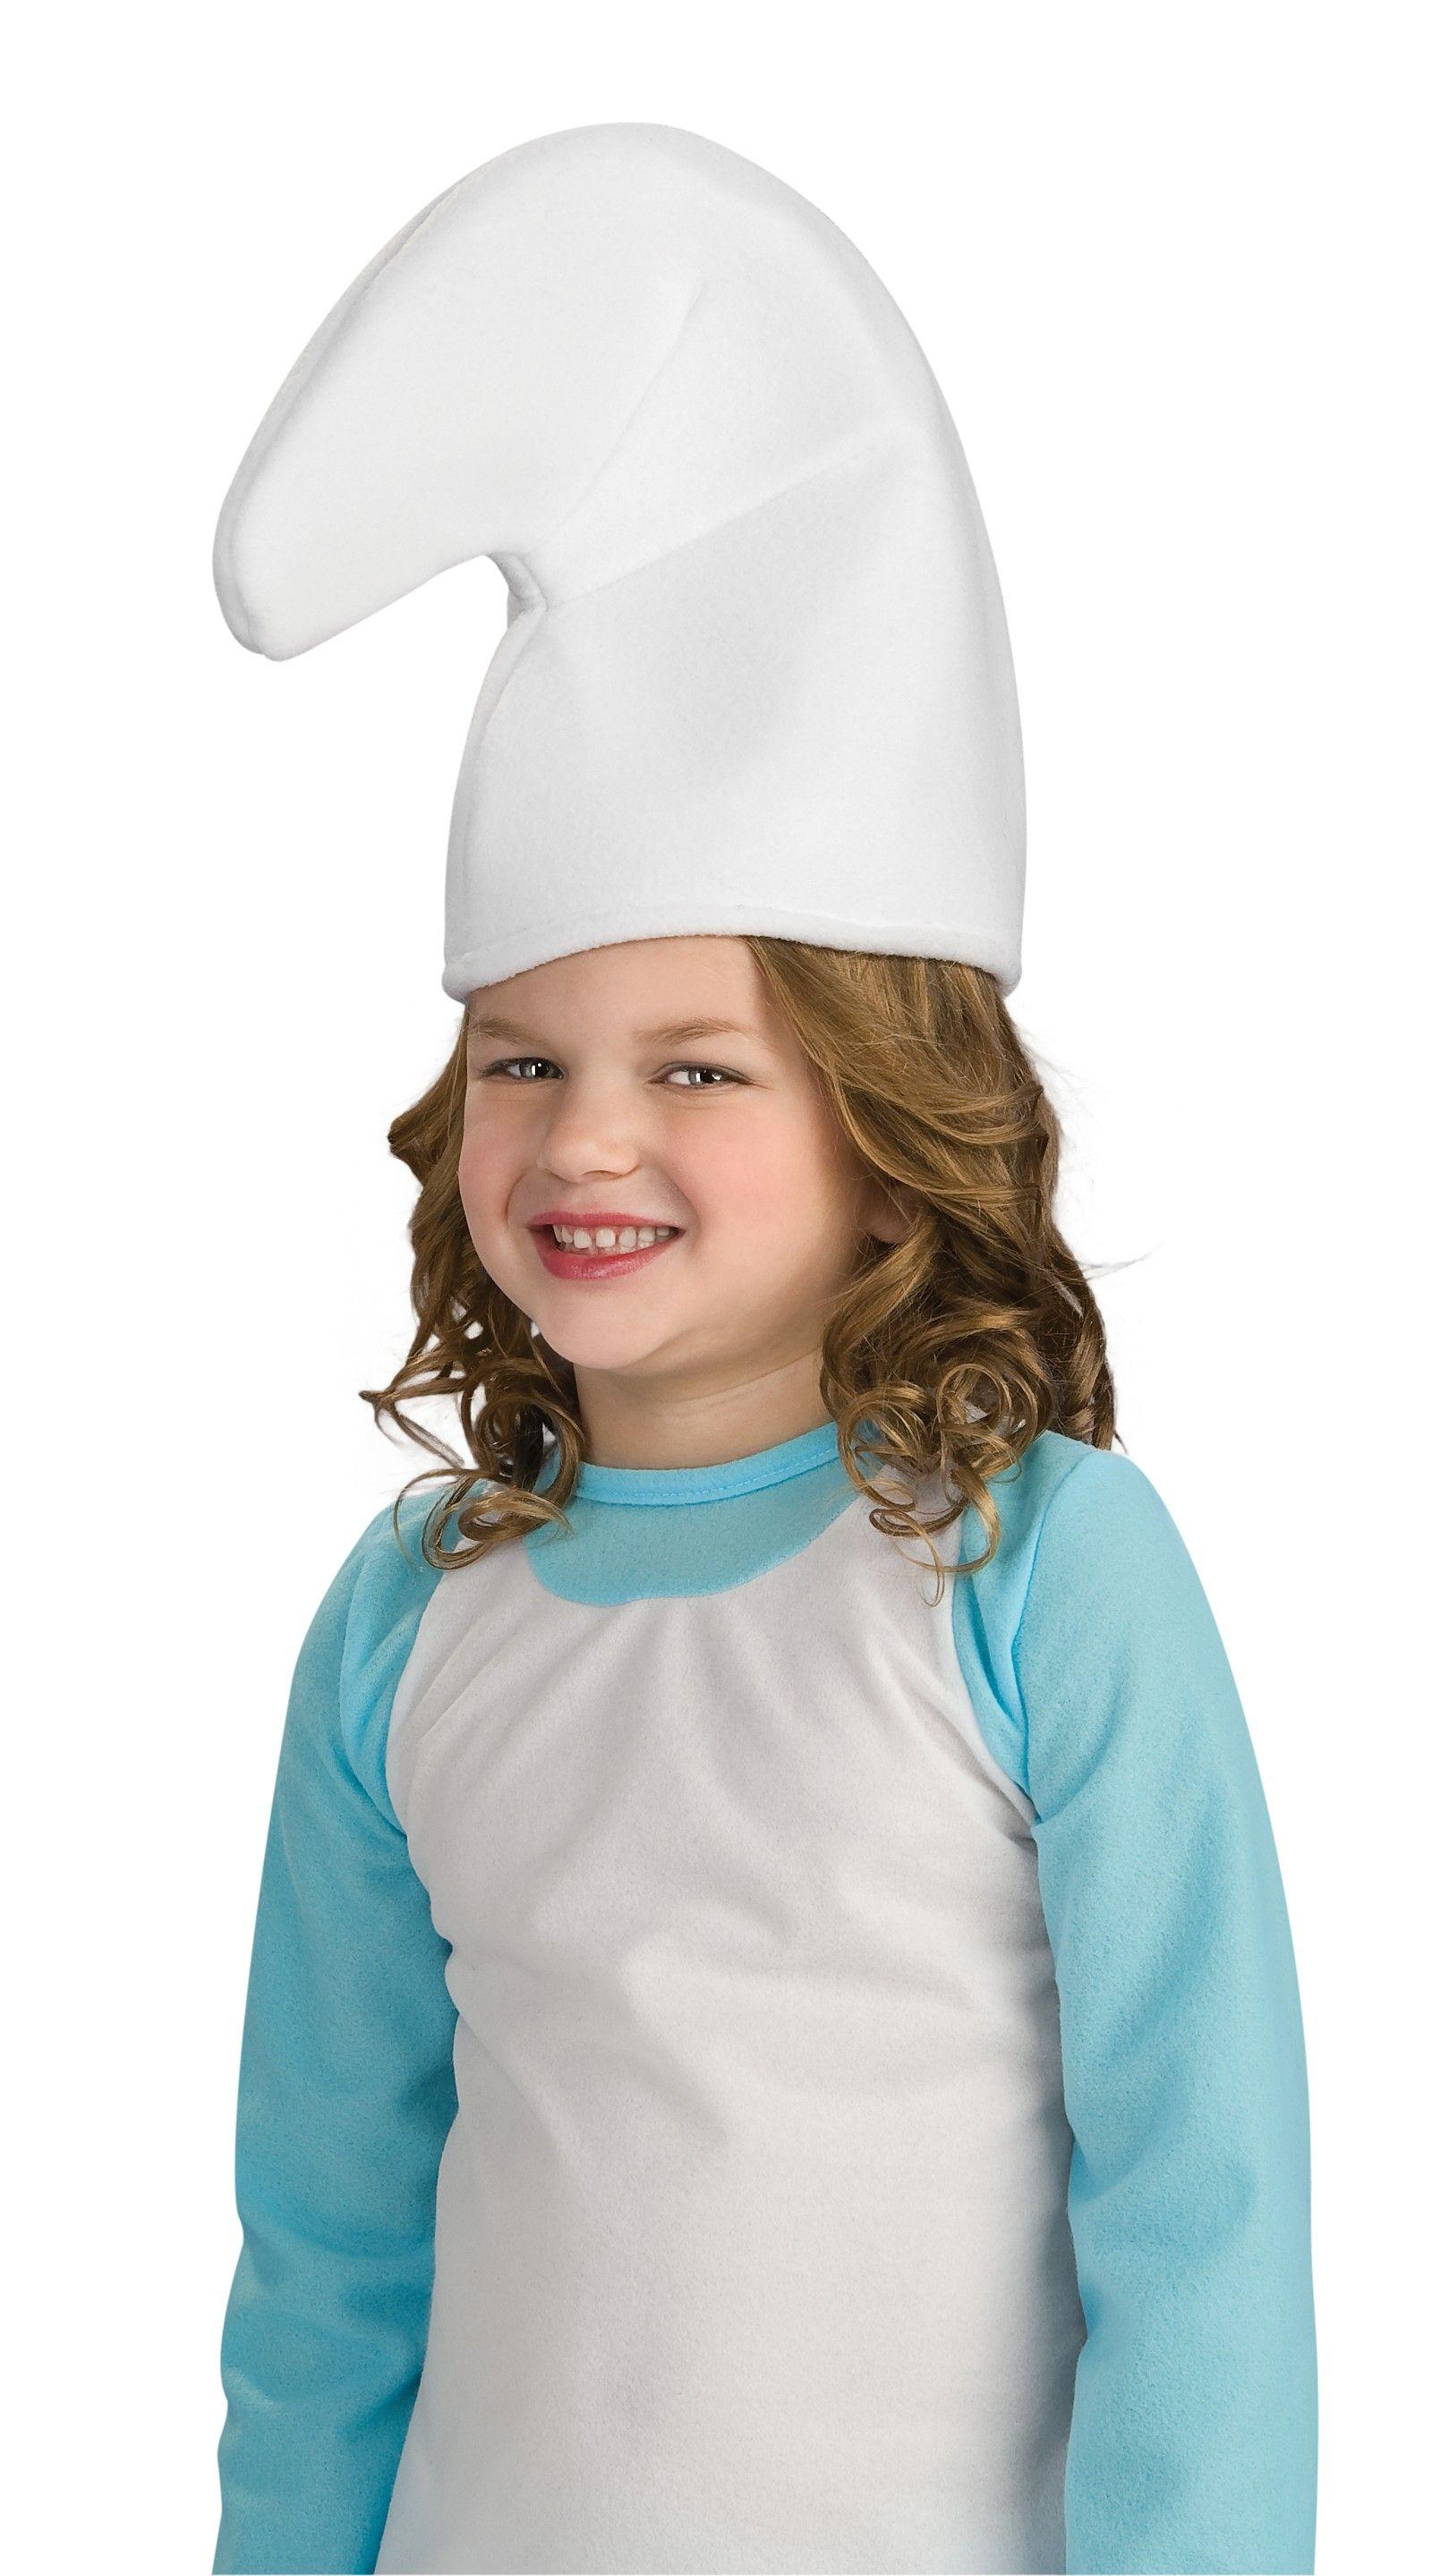 The Smurfs - Child Gnome Hat Costume Accessory | The Smurfs ...